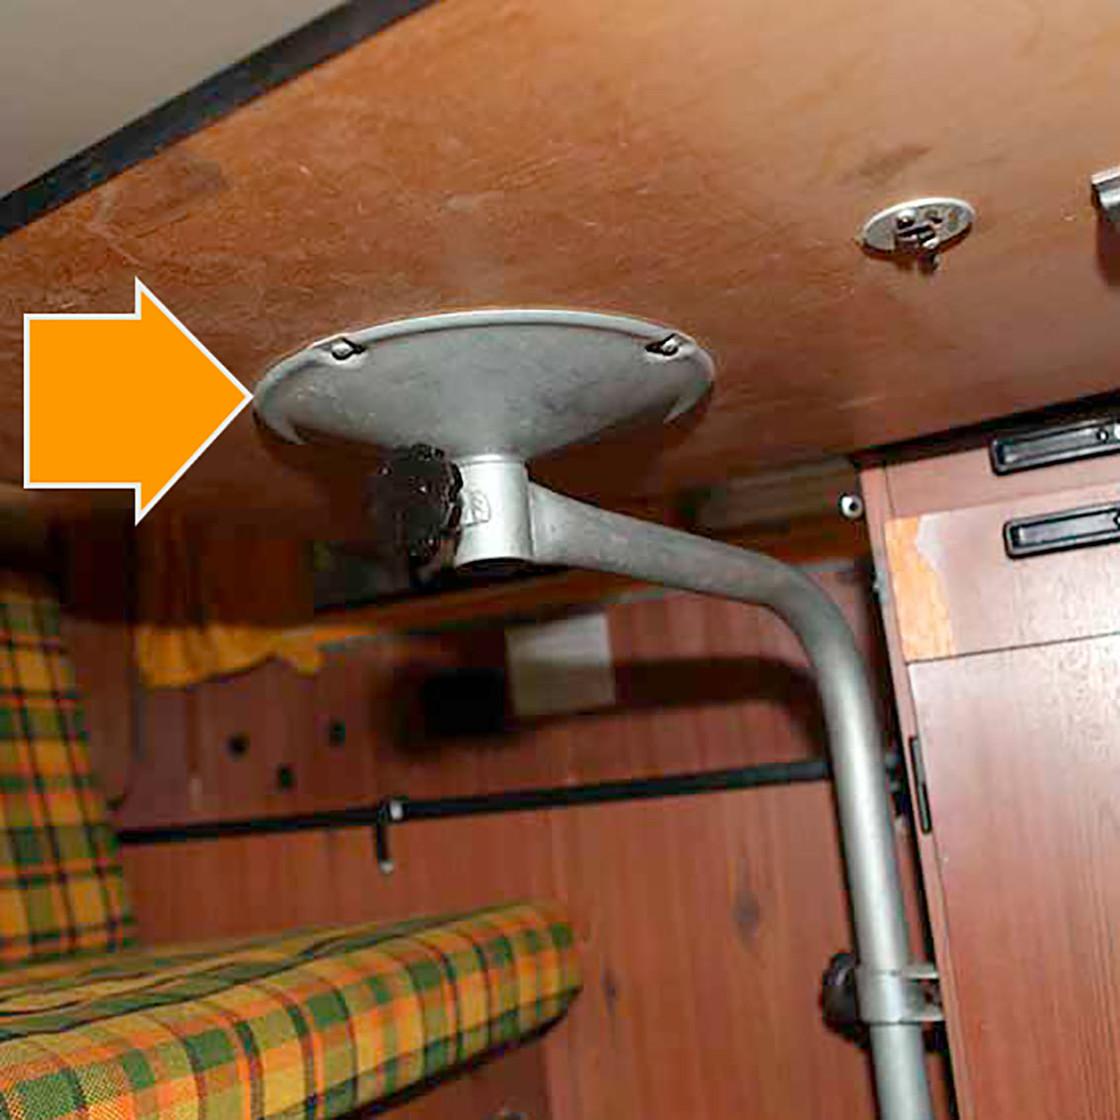 t2 tischbefestigung f r vw bus westfalia helsinki berlin. Black Bedroom Furniture Sets. Home Design Ideas